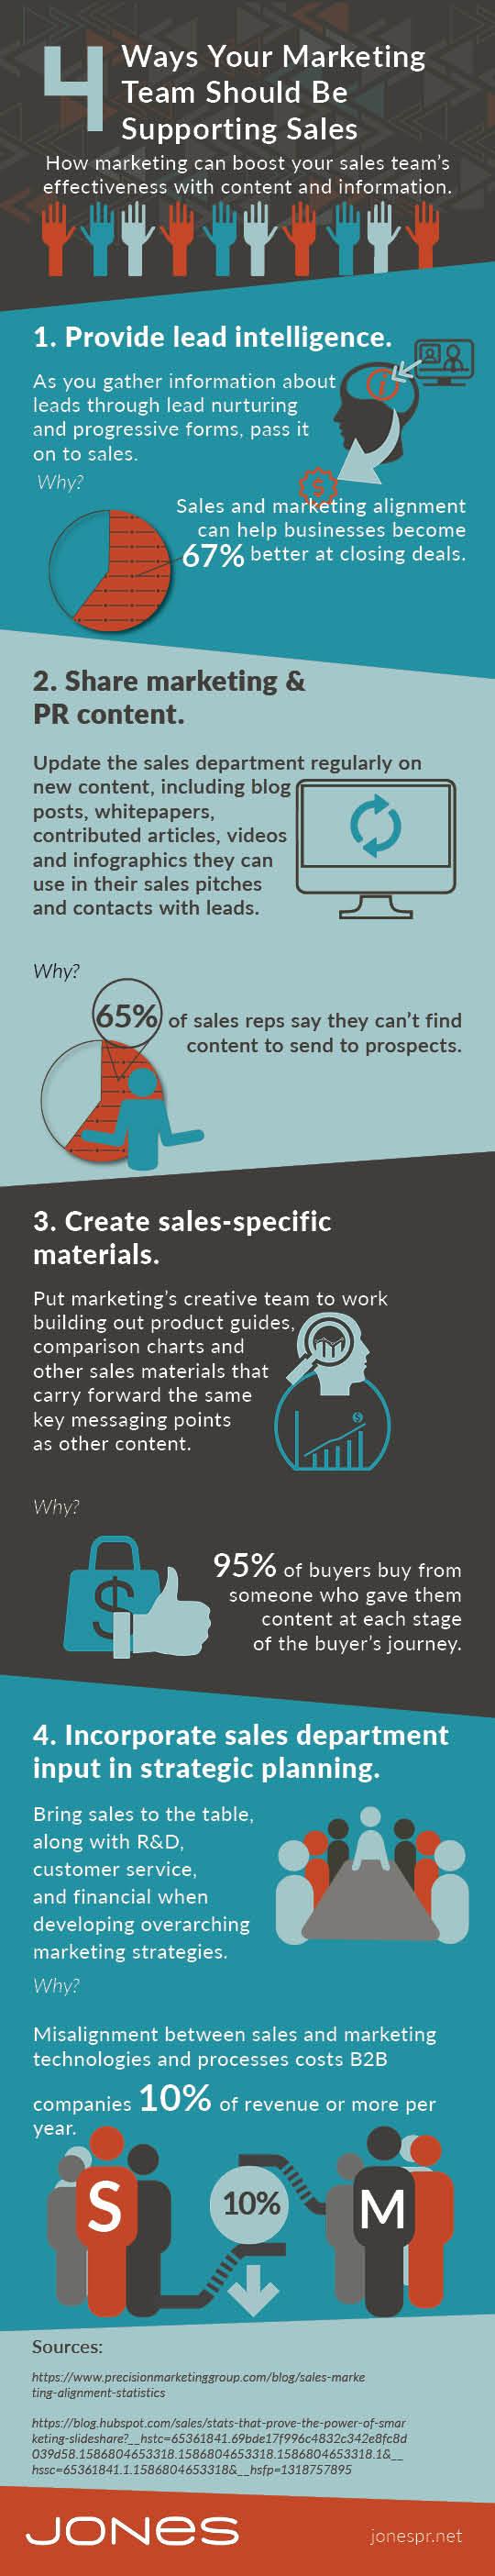 jones infographic sales enablement checklist